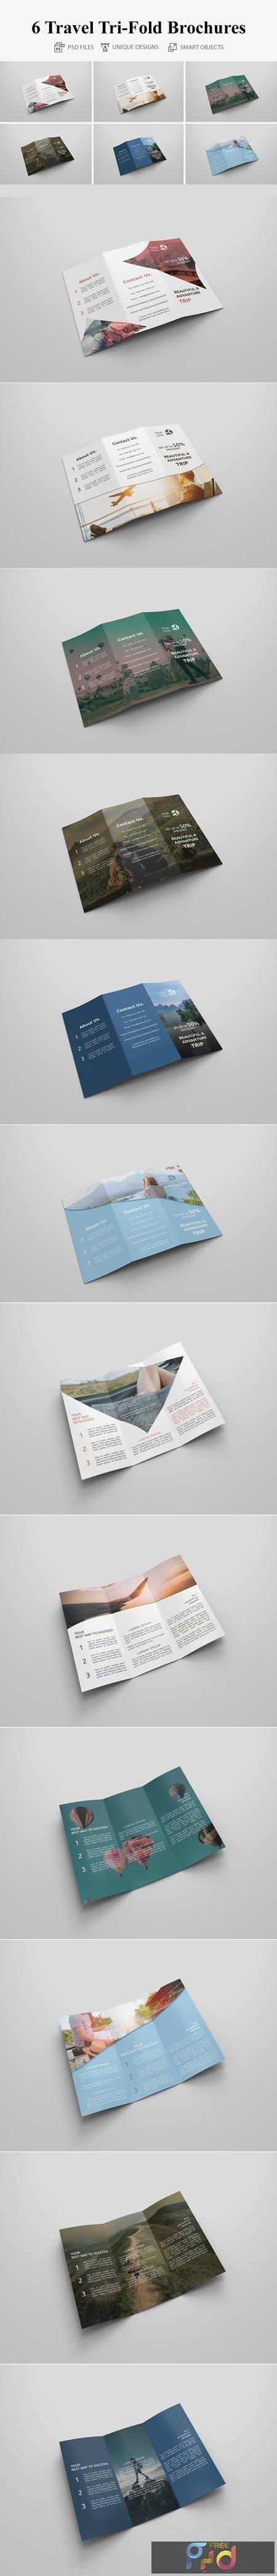 Travel Tri-fold Brochures 4401680 1